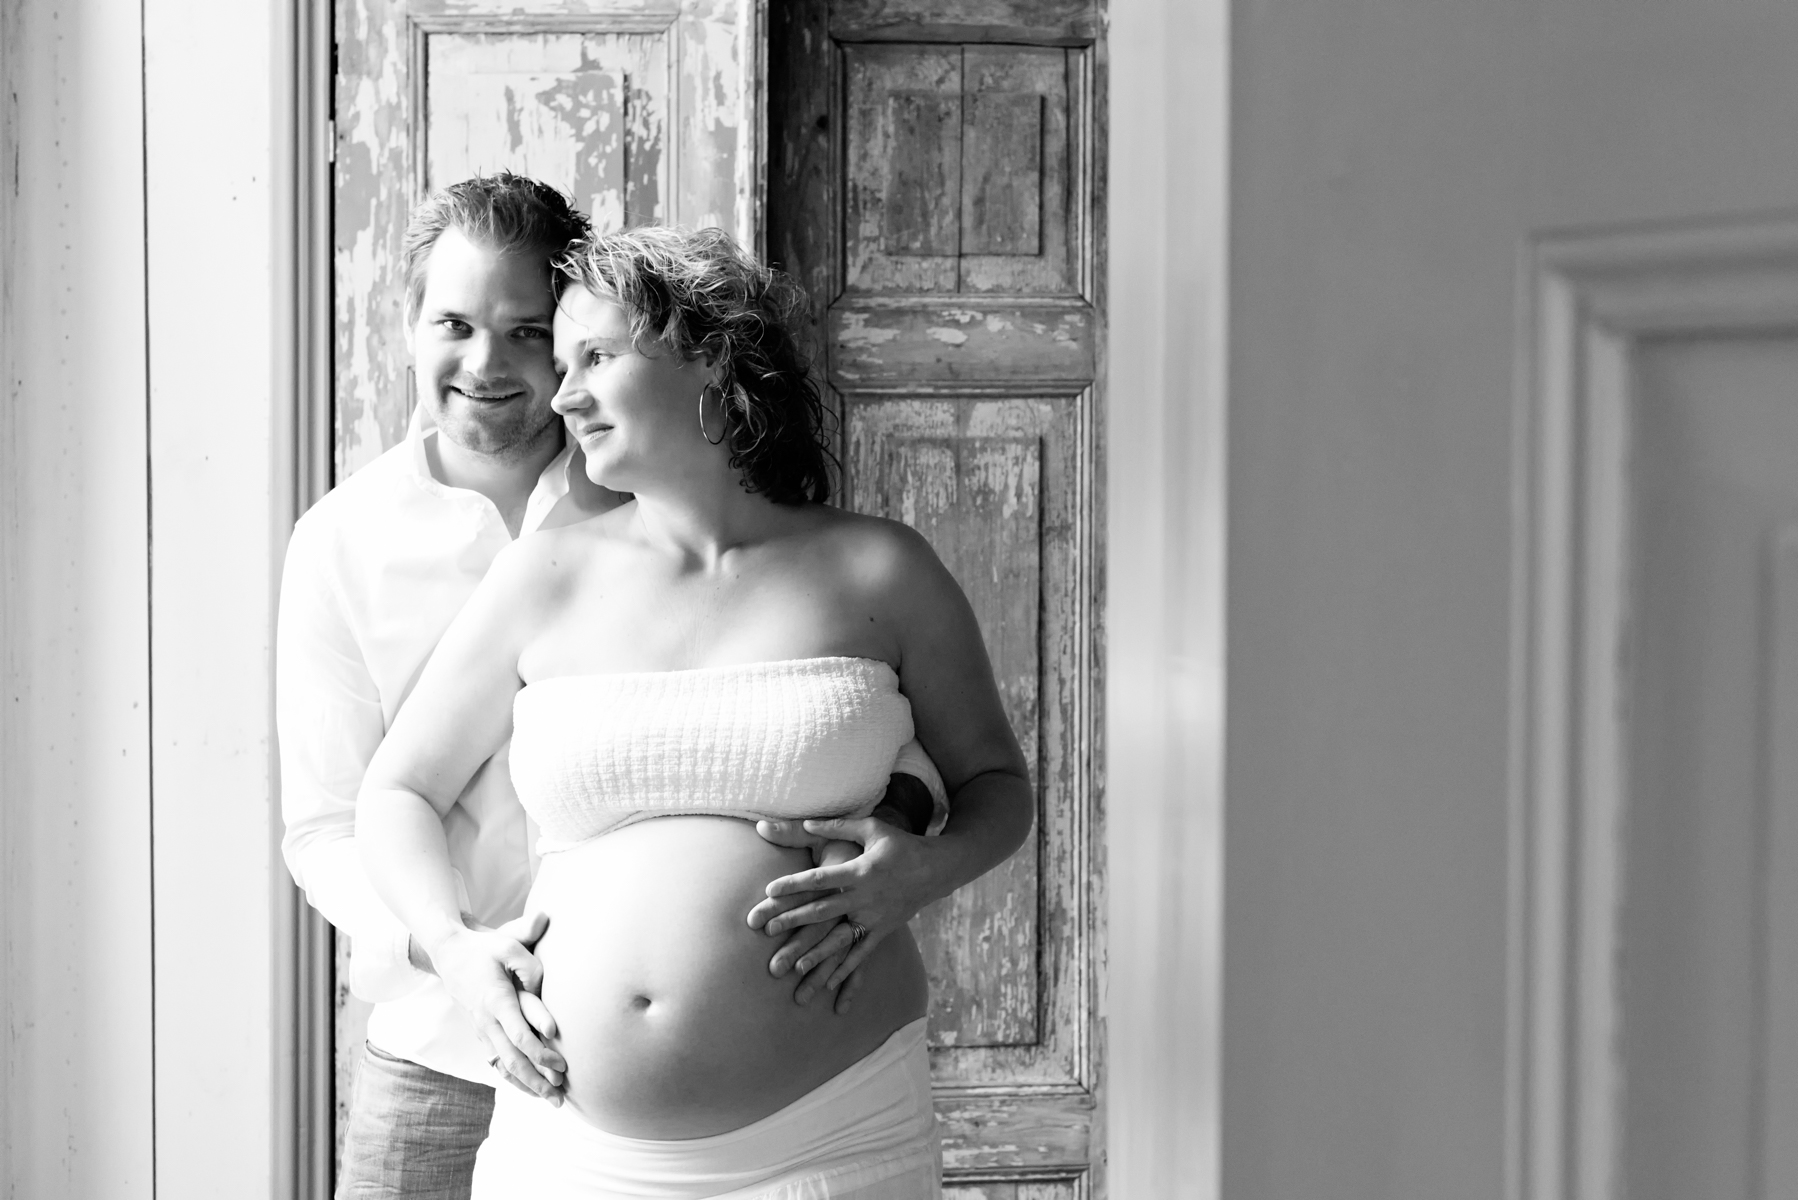 zwangerschapssfotoshoot noord-holland